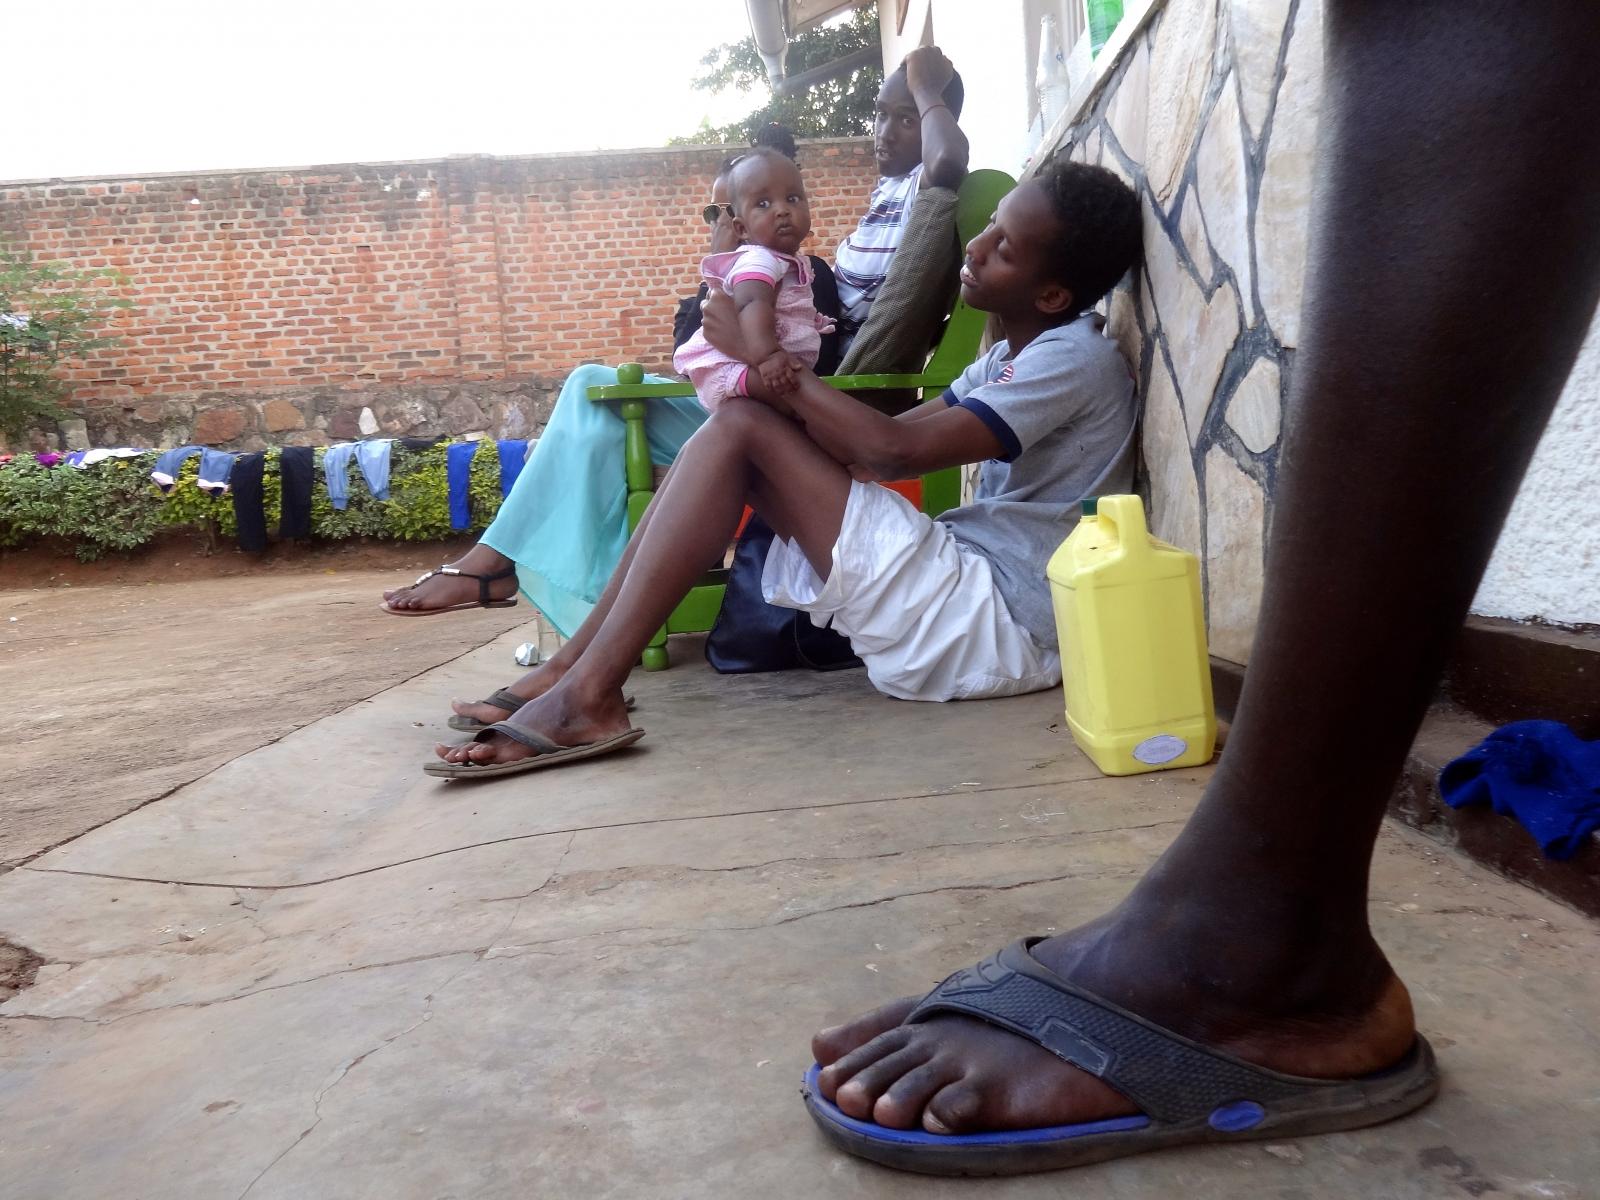 Little Burundi